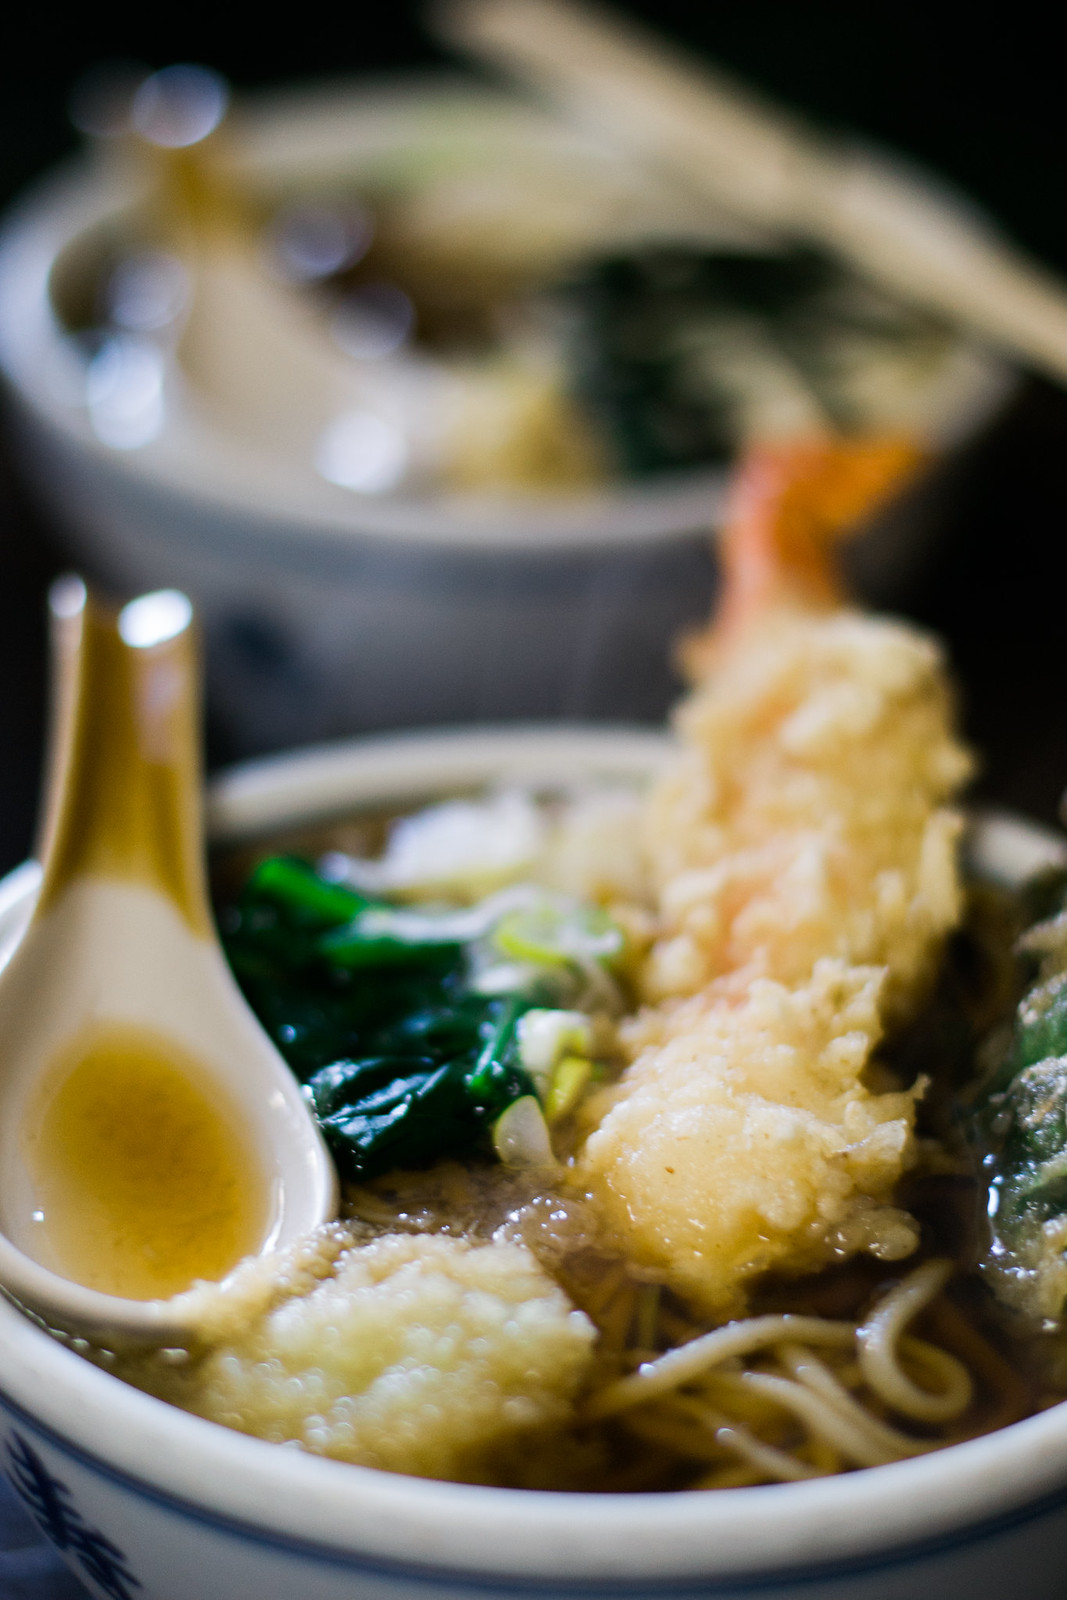 My tempura soba was first served